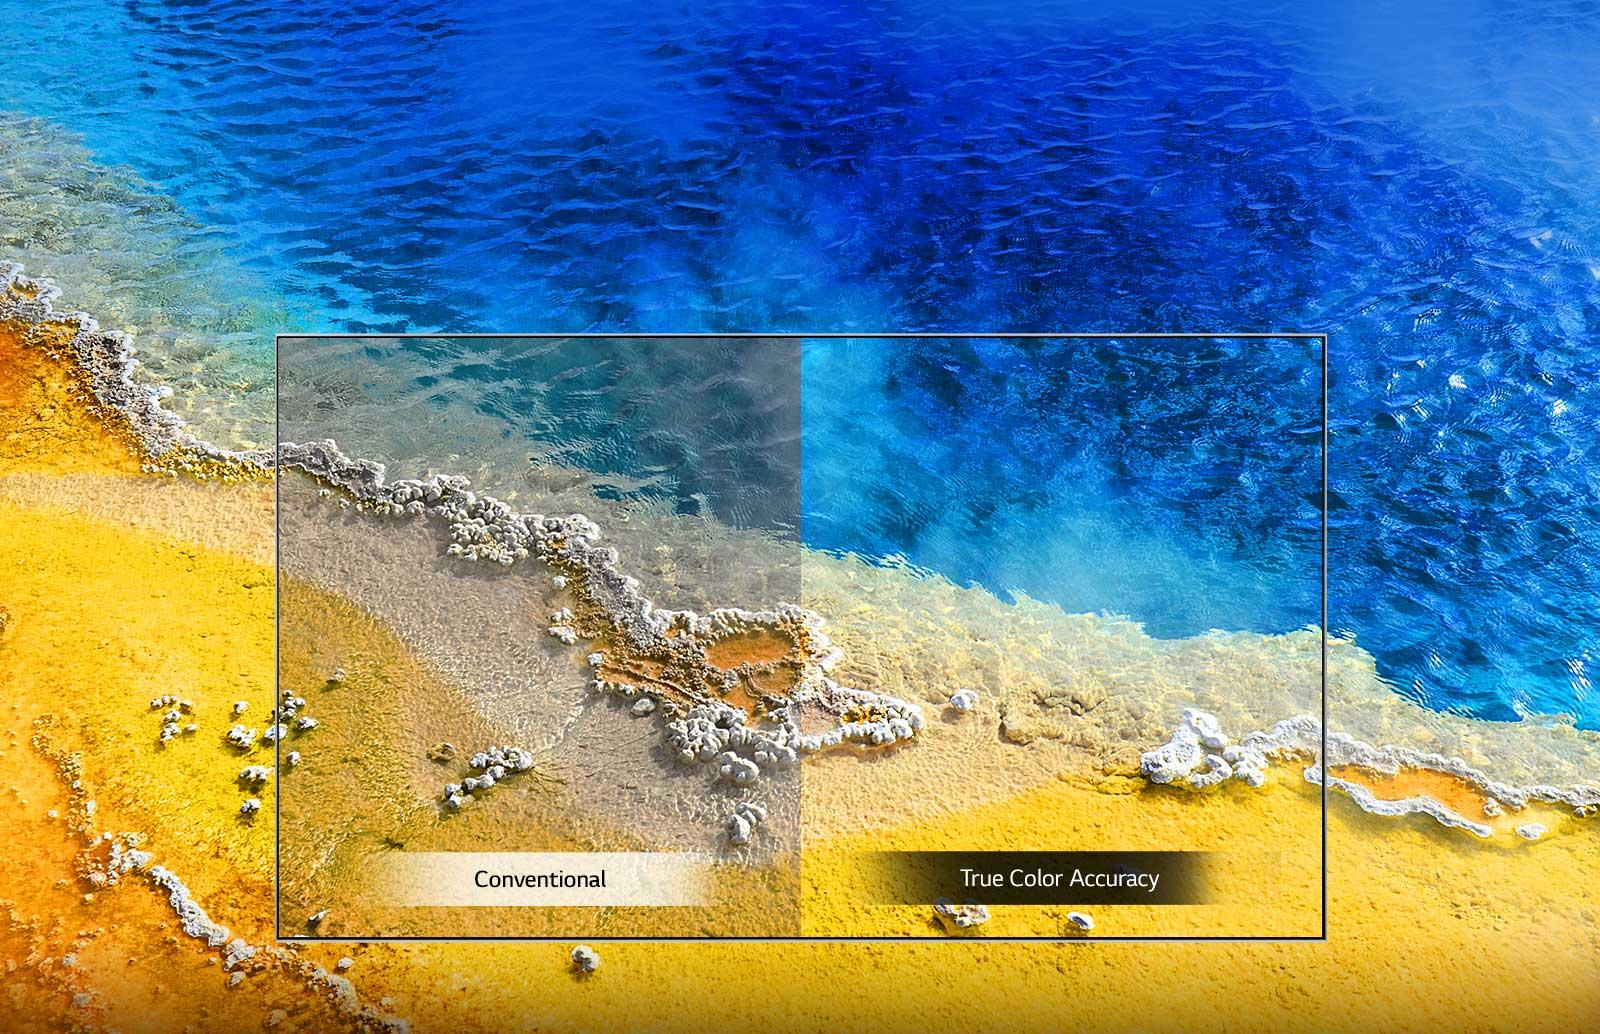 LG Ultra HD TV True Color Accuracy